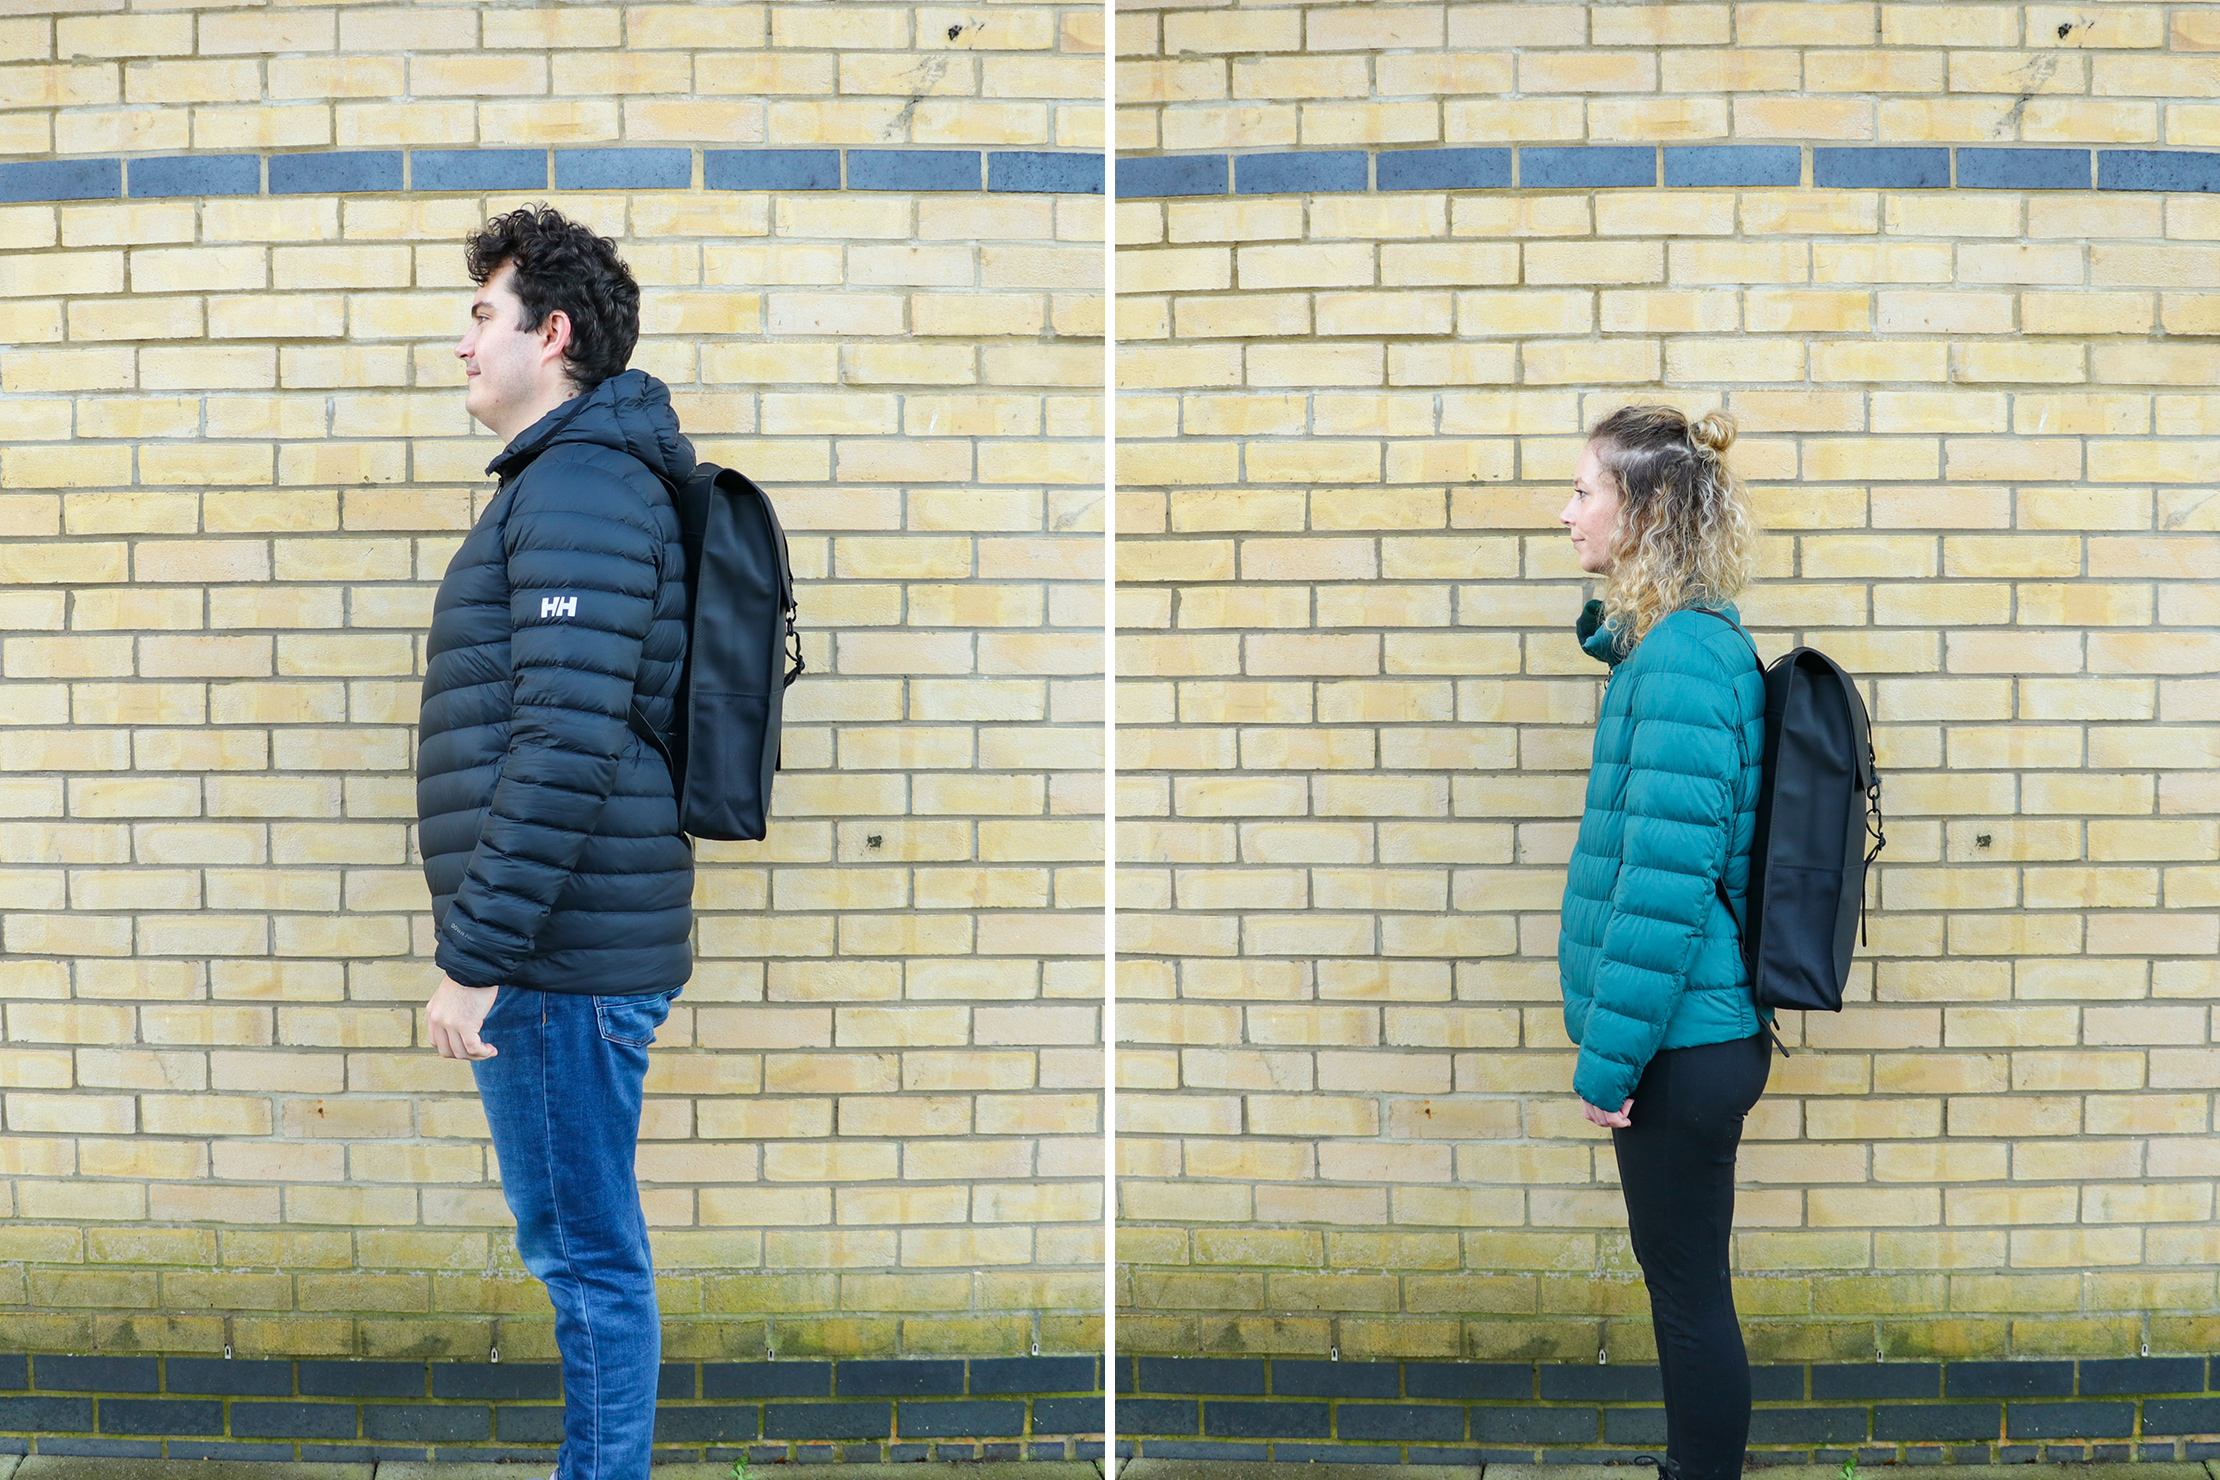 "Left: Rebecca Coates, Height, 5'7"" (170 cm), Torso: 16"" (41 cm) | Right: Nathan Coverdale, Height, 6'4"" (193 cm), Torso: 19"" (48 cm)"